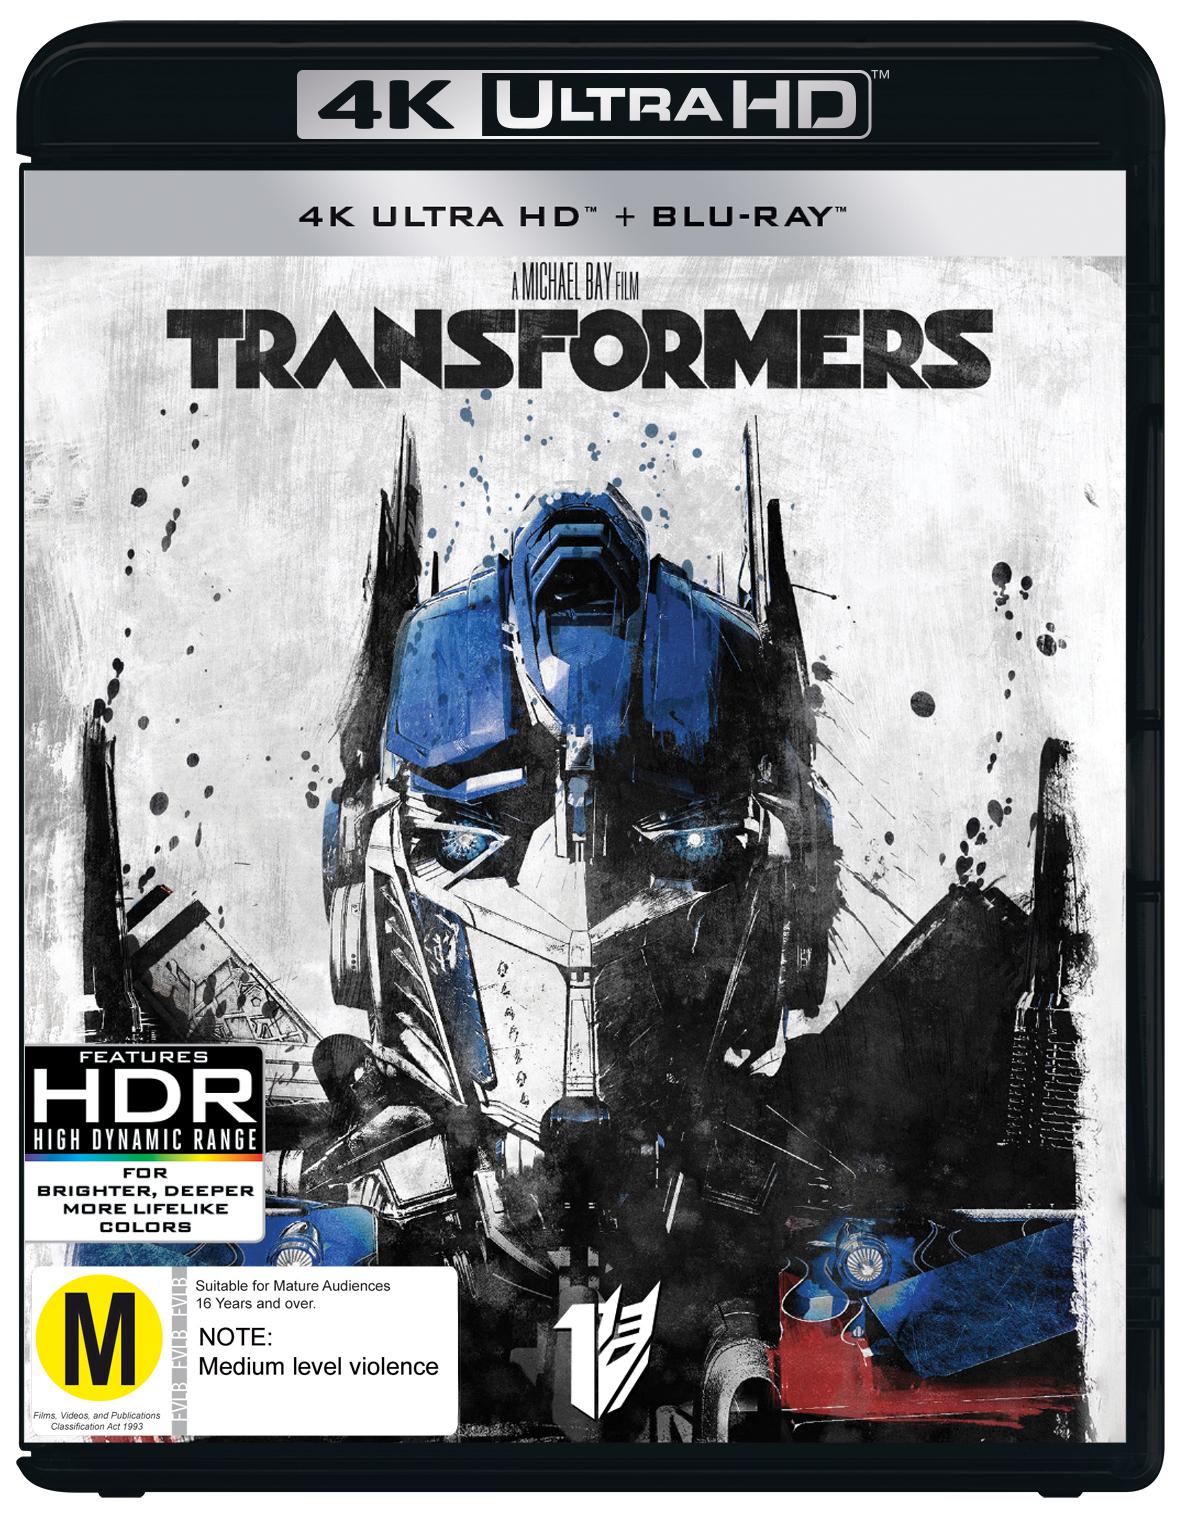 Transformers on UHD Blu-ray image